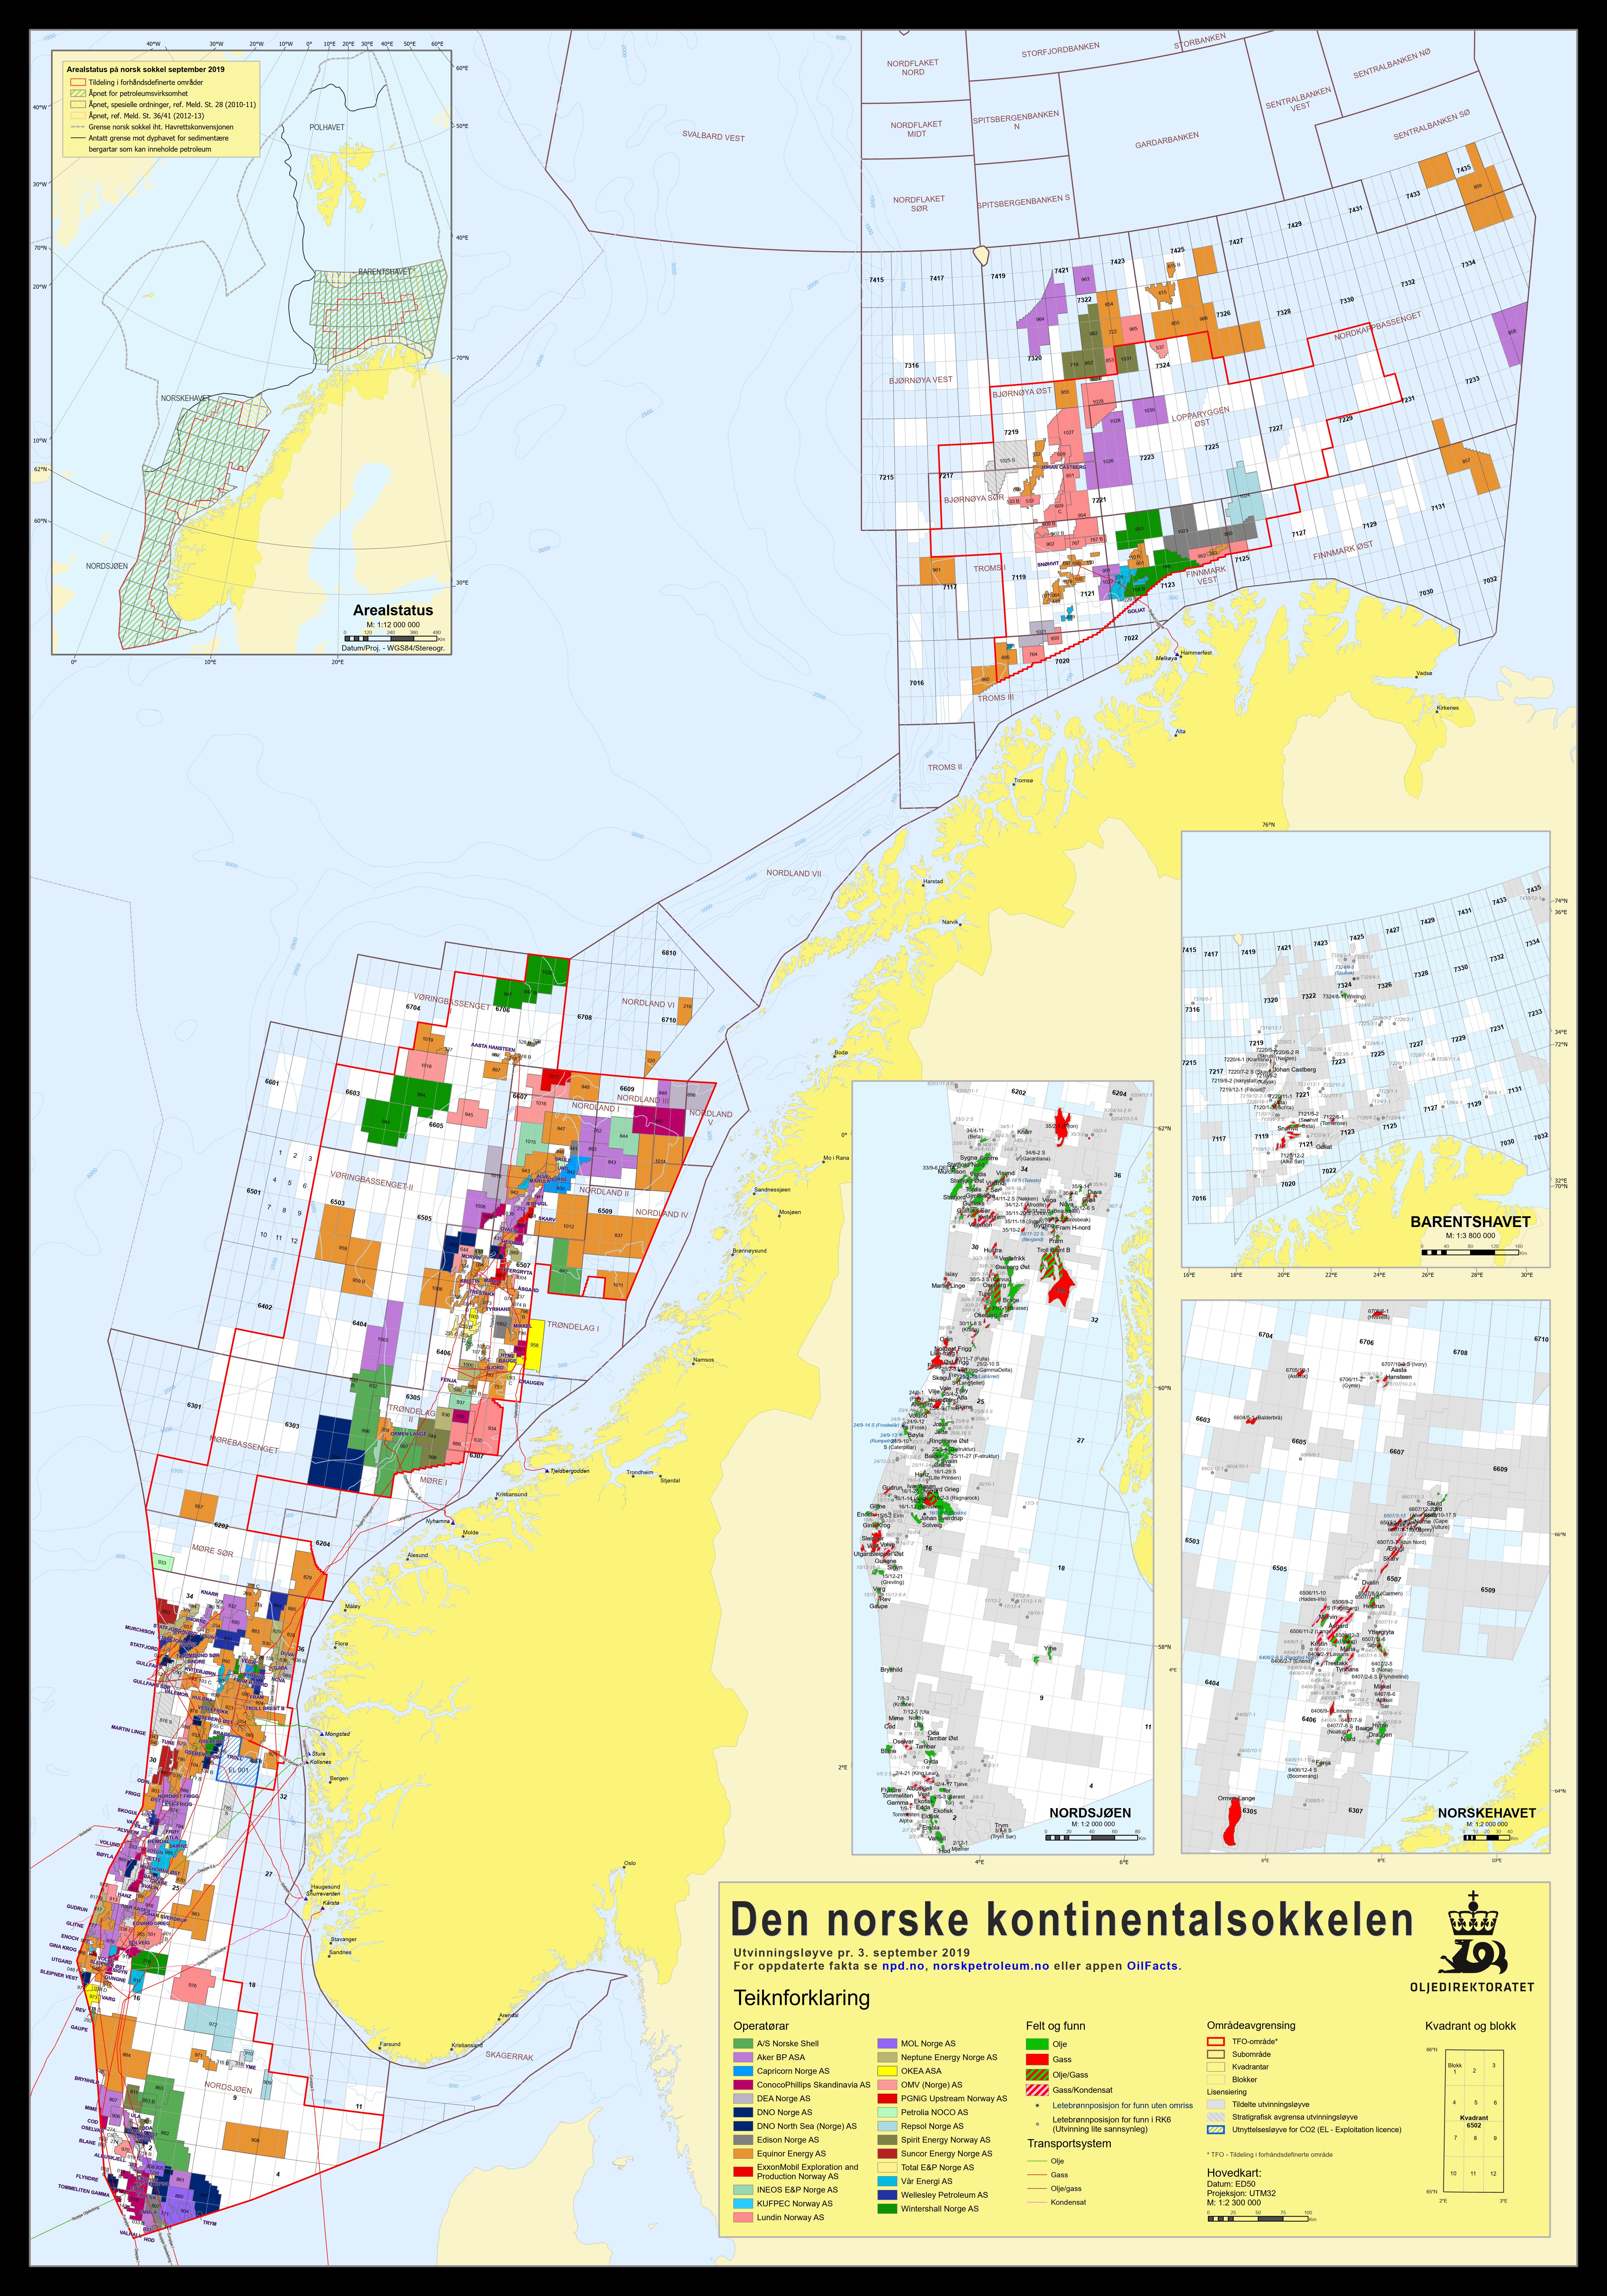 Kilde / Source: Oljedirektoratet / Norwegian Petroleum Directorate